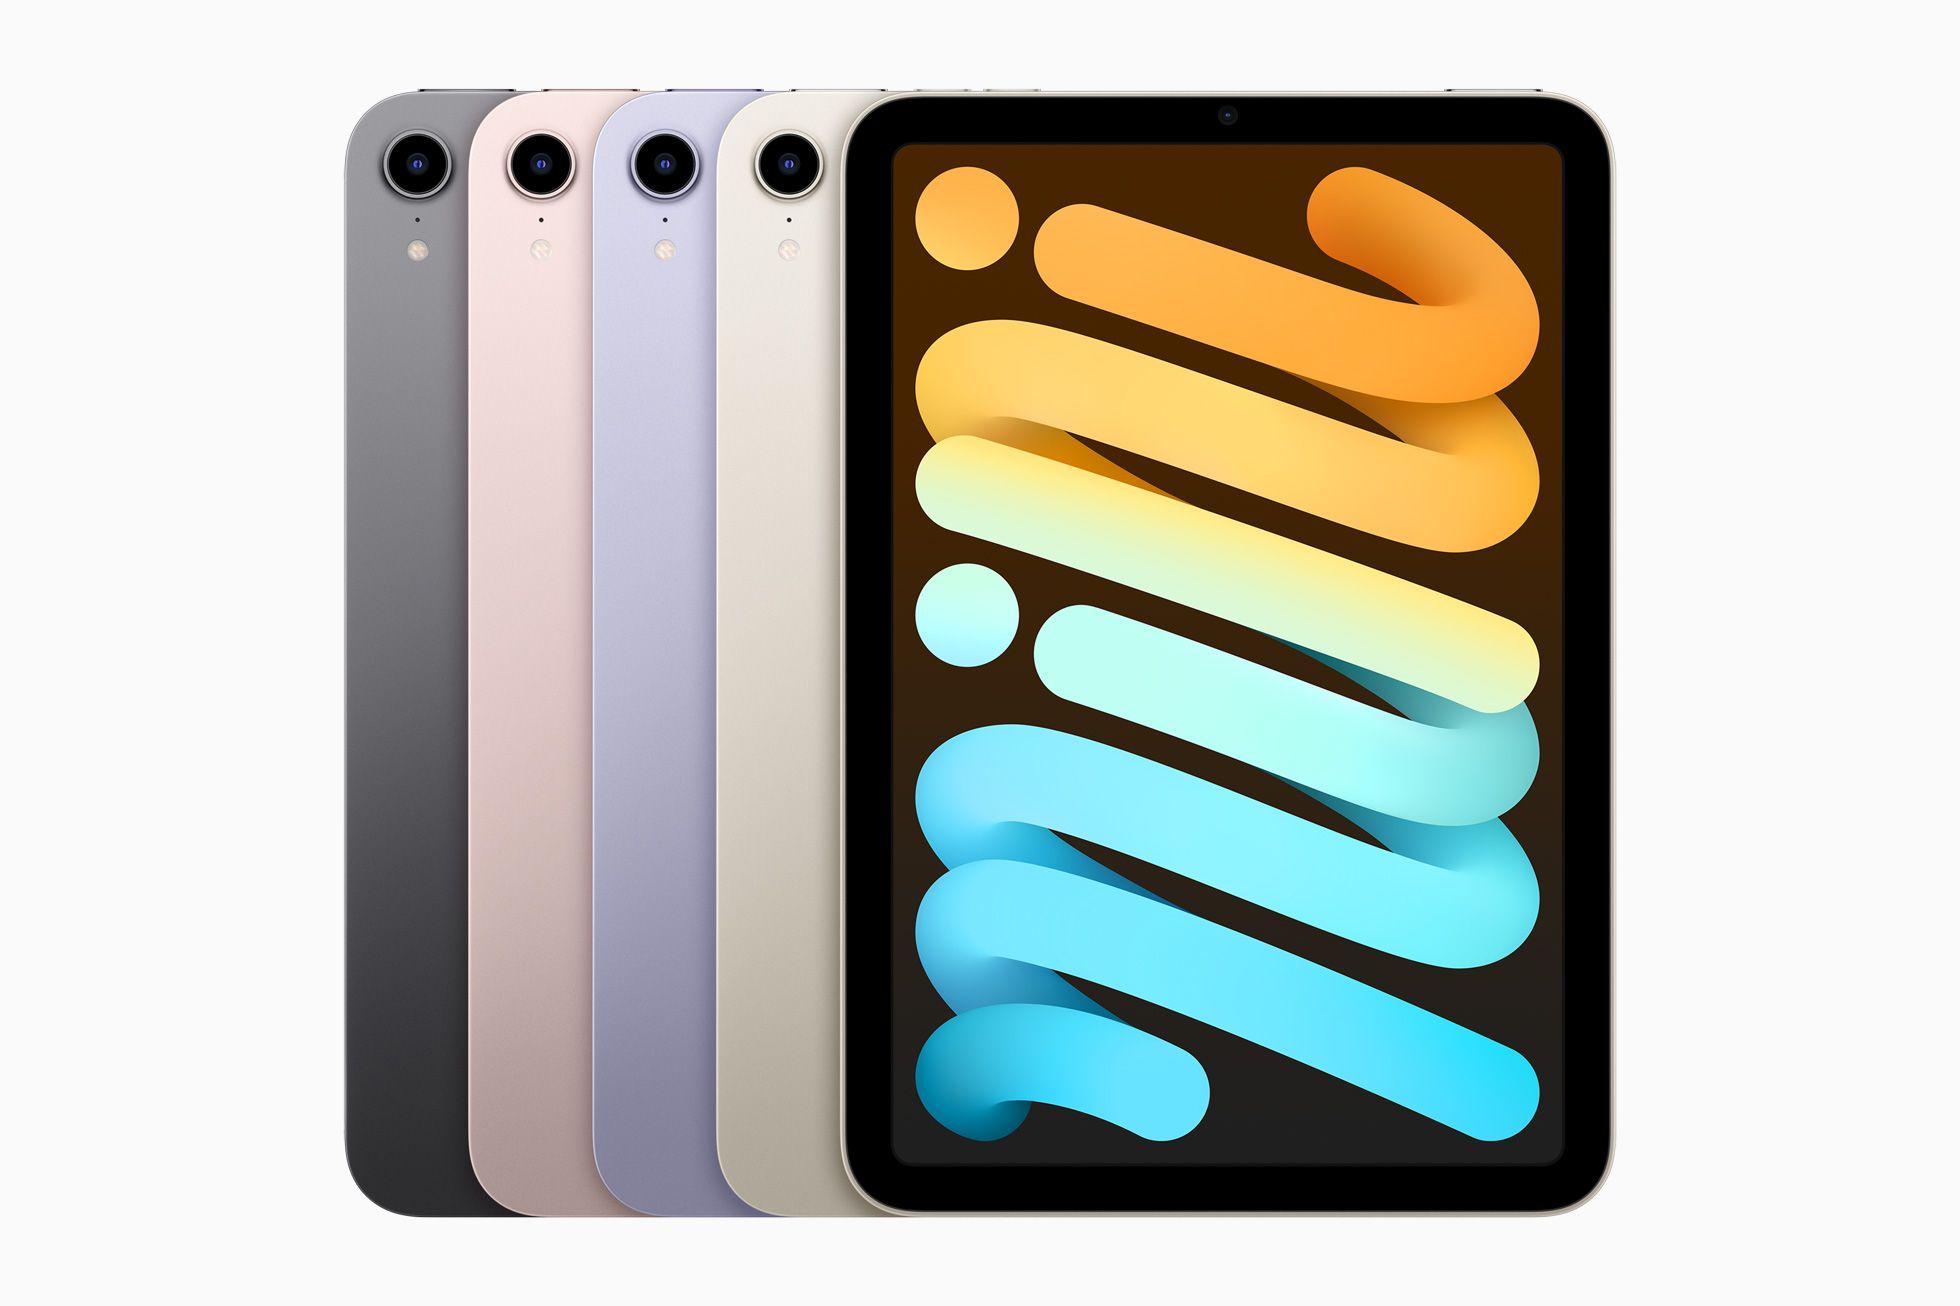 new iPad mini in various colors